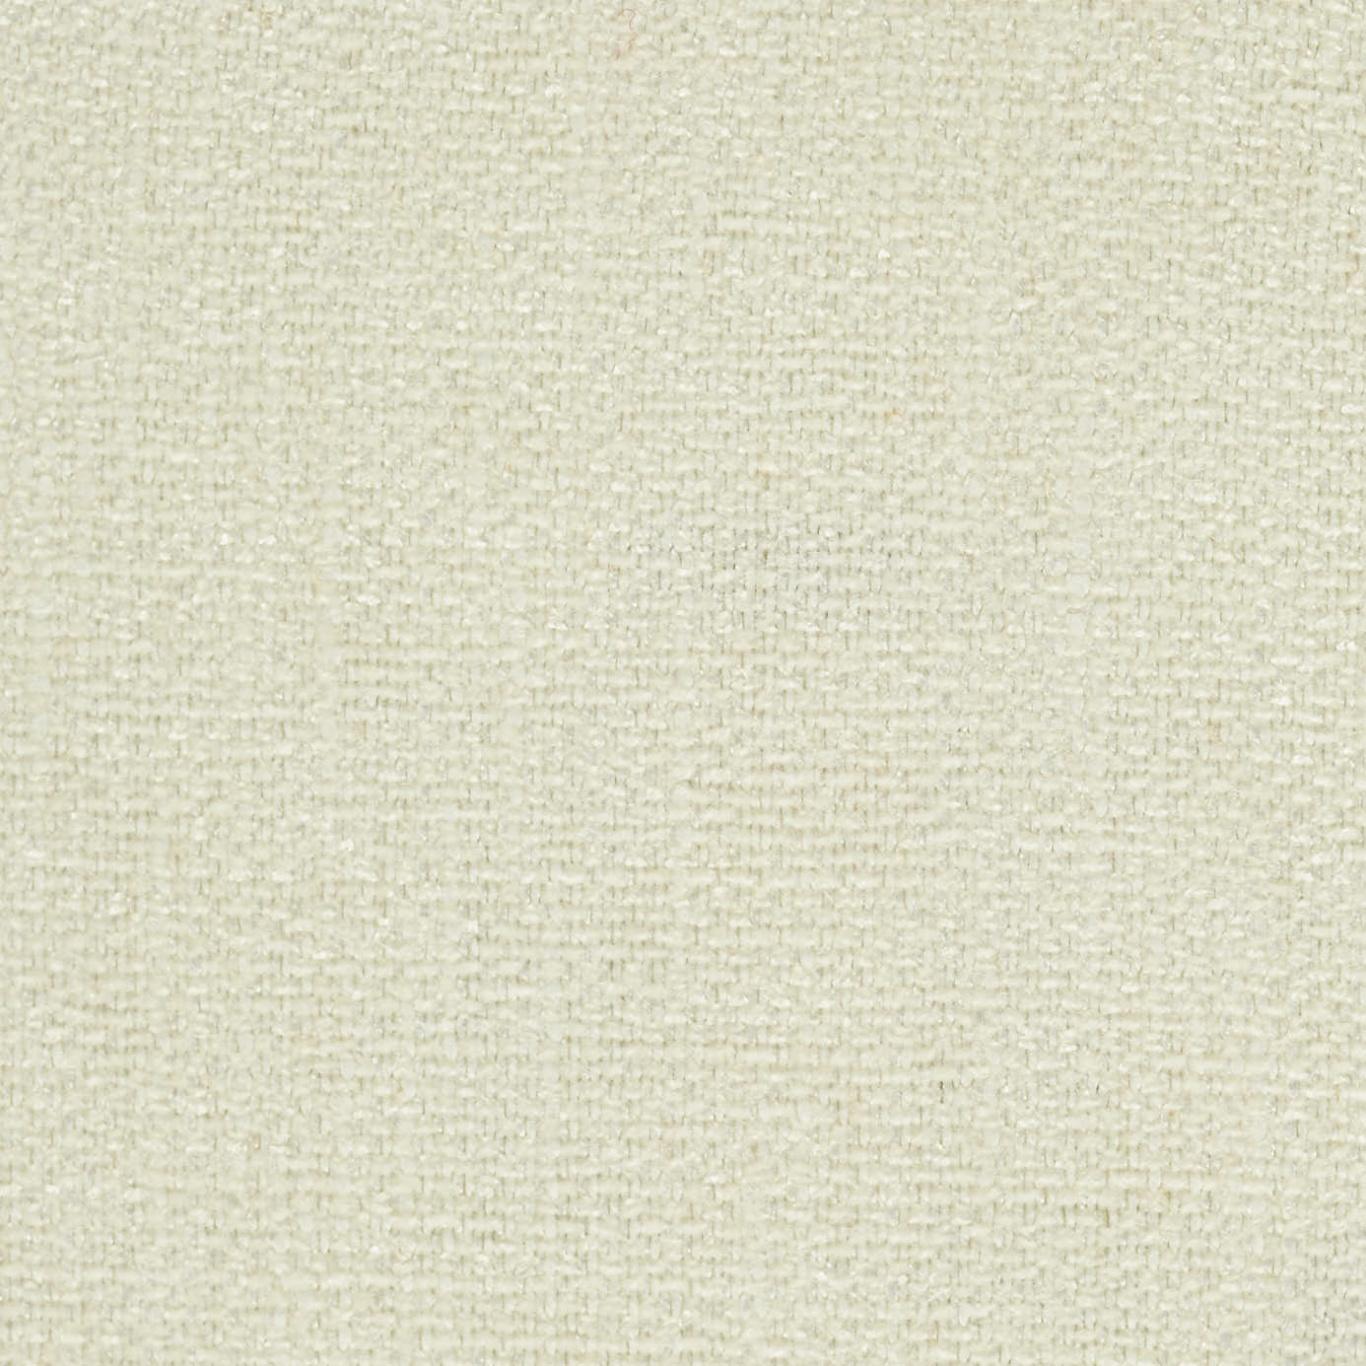 Image of Harlequin Molecule Coconut Fabric 440001